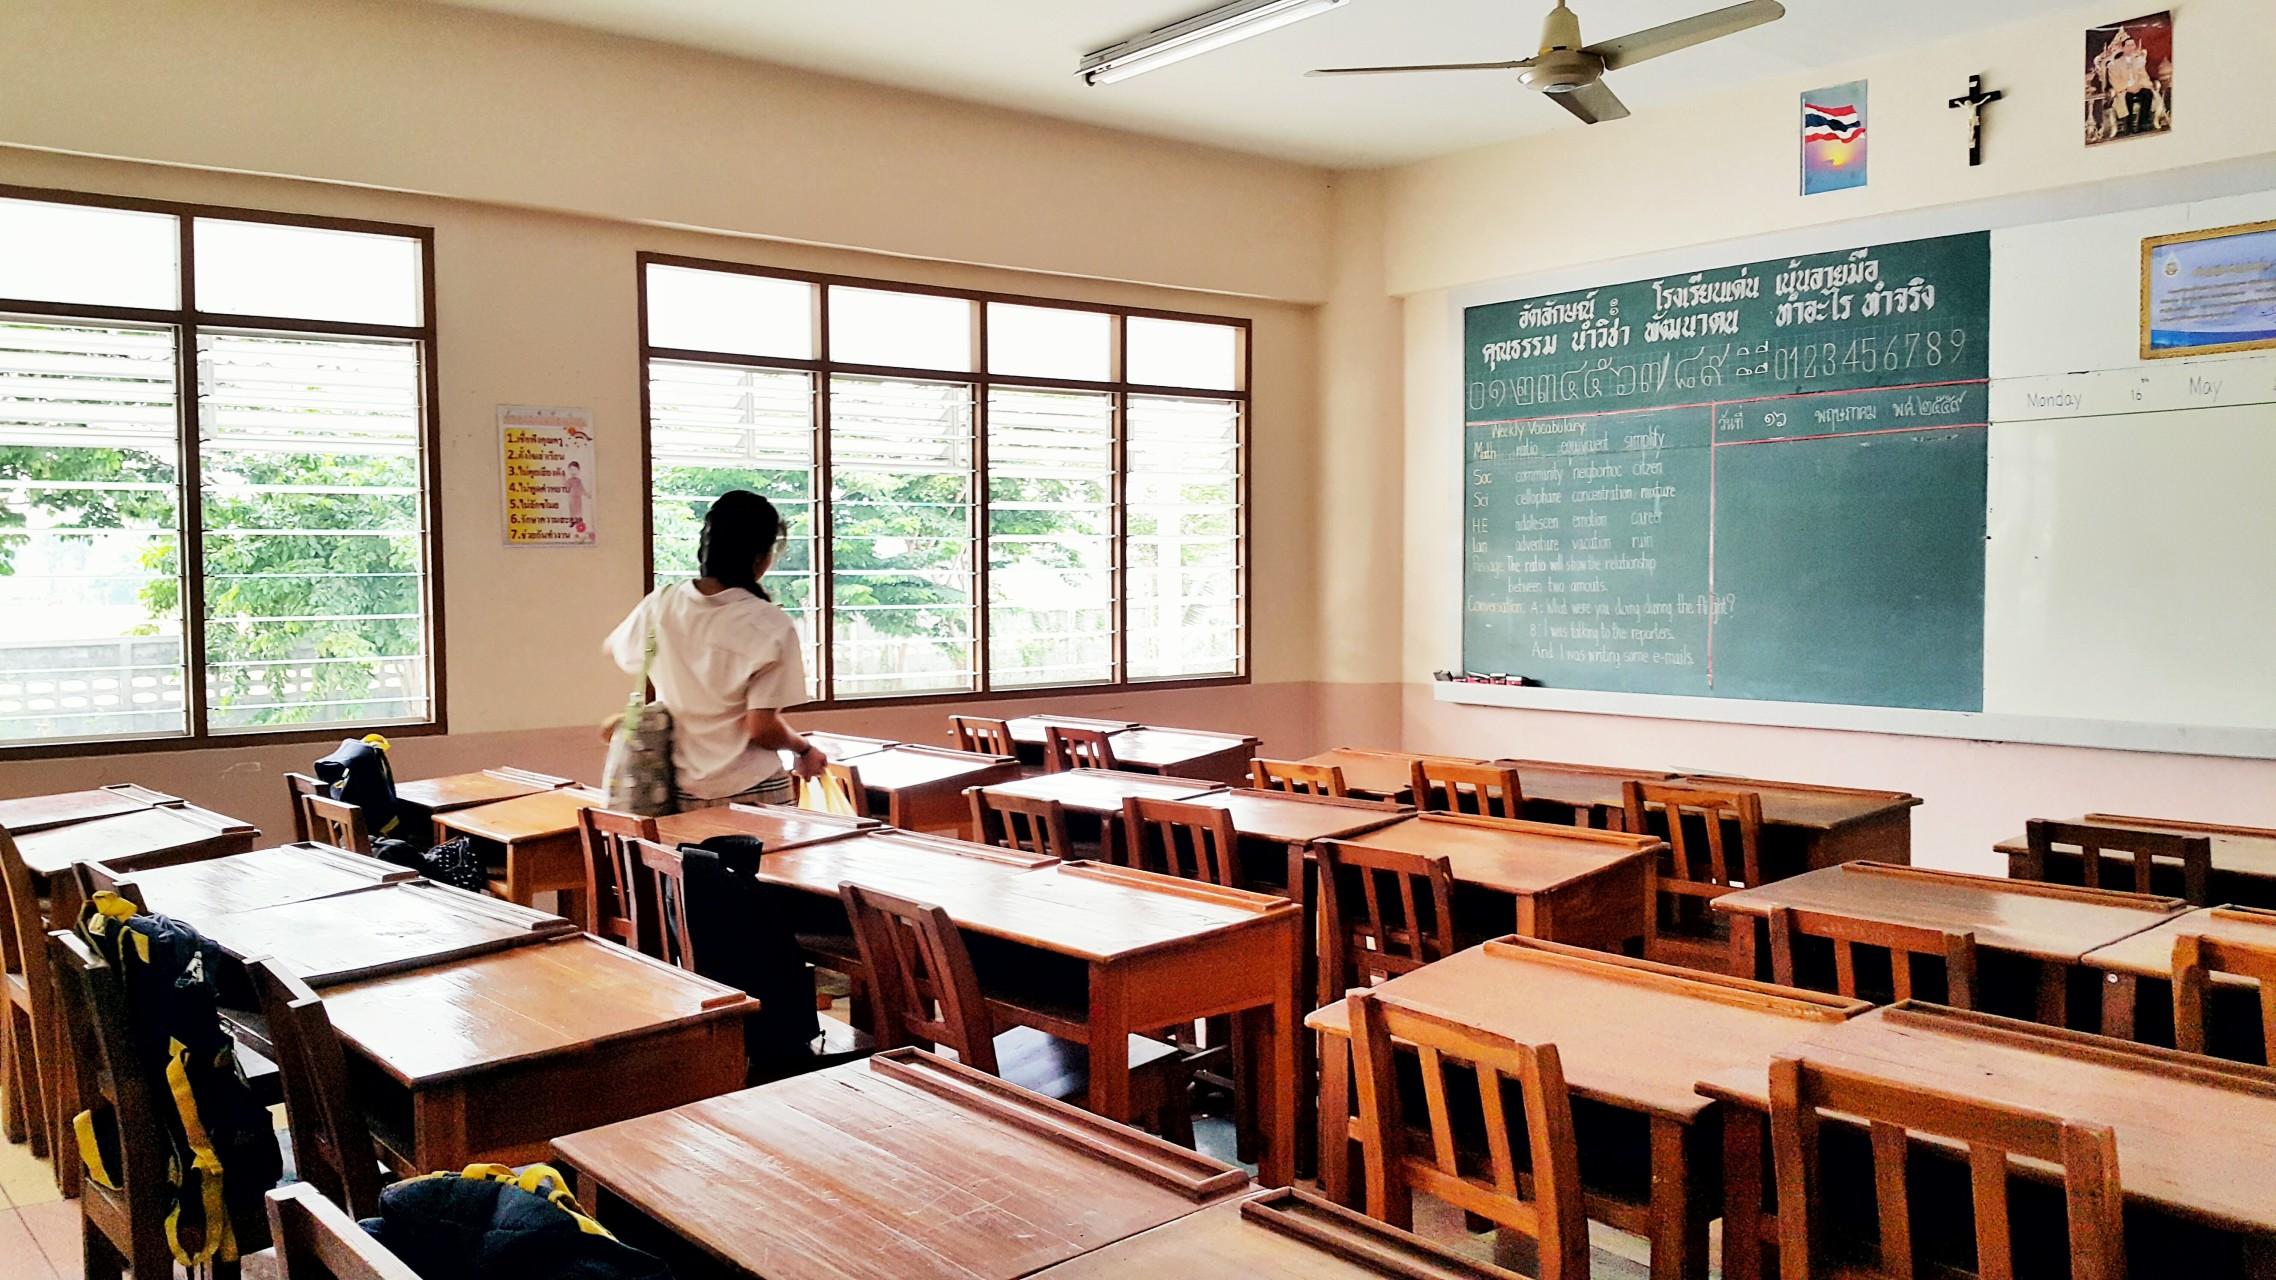 classroom-begin-student-in-classroom